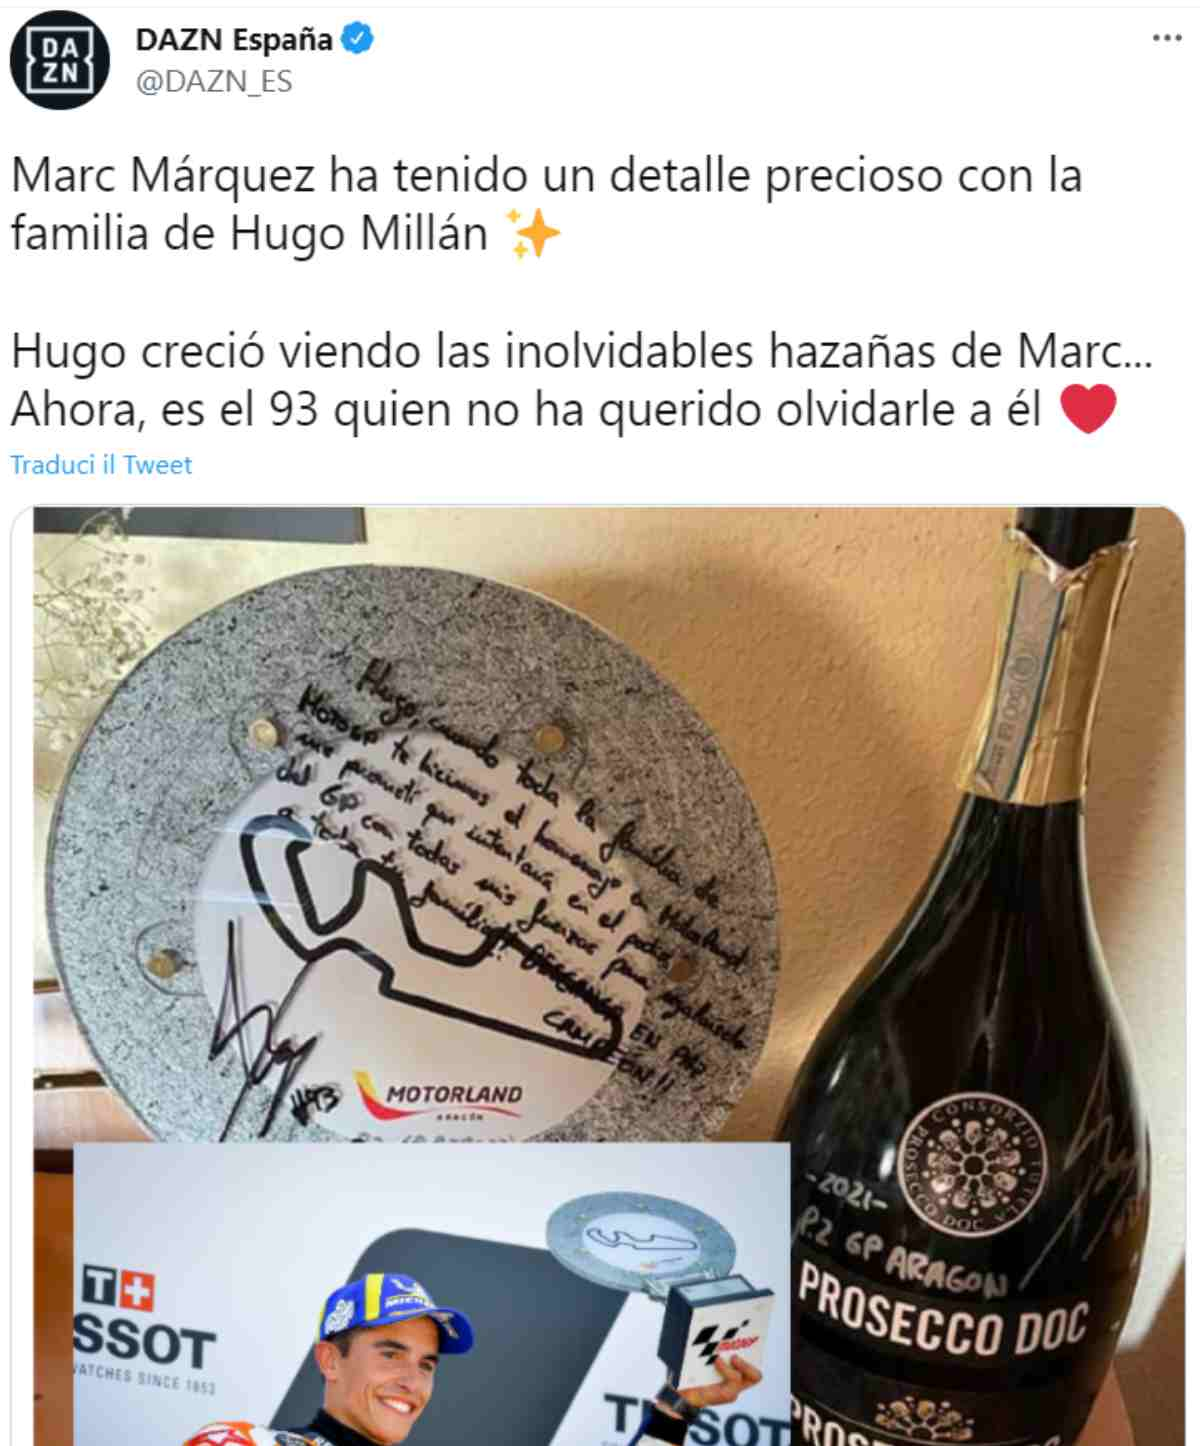 Marquez (Twitter)